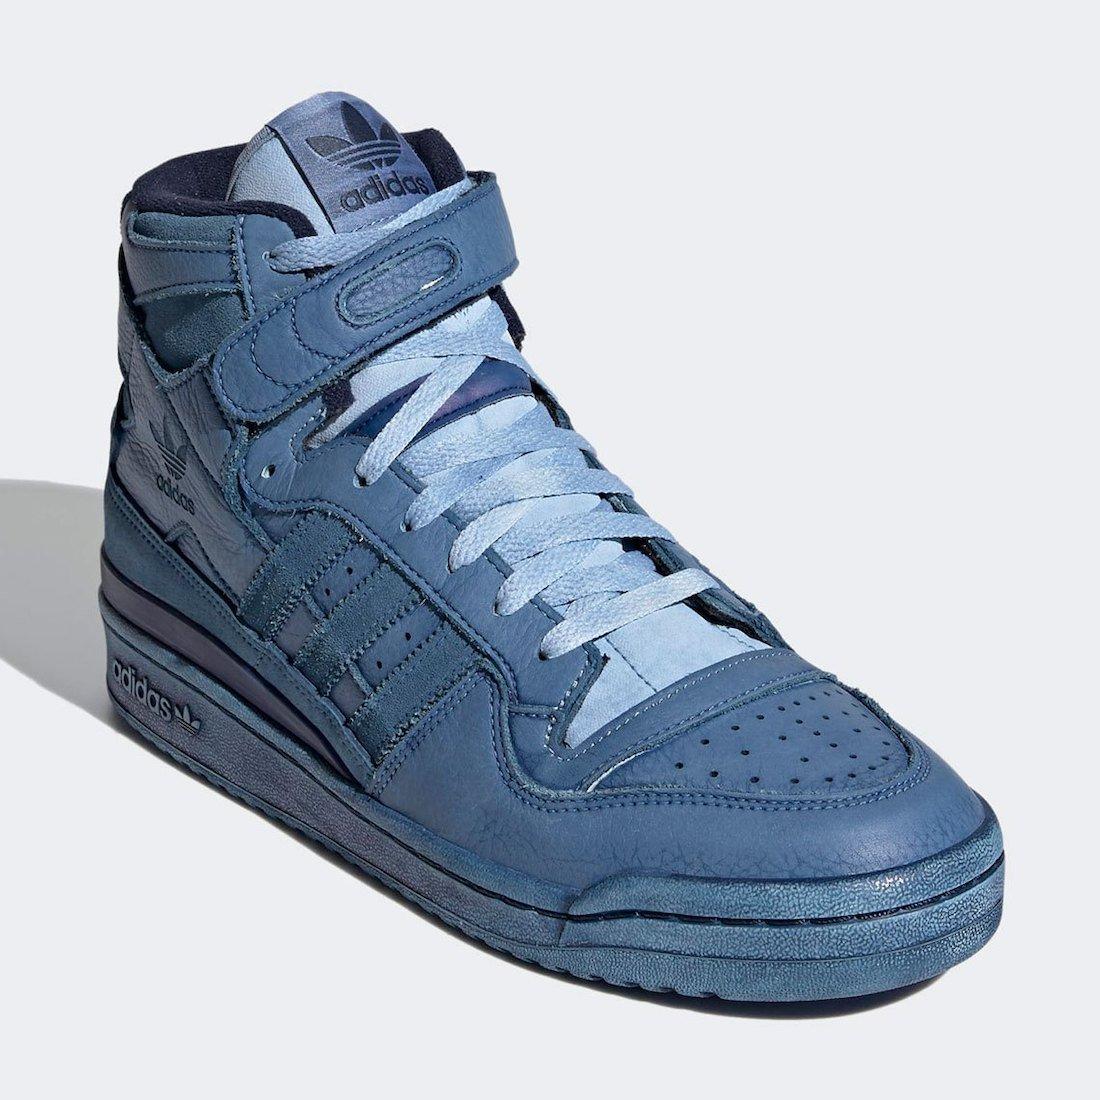 adidas Forum 84 High Indigo Blue FY7794 Release Date Info